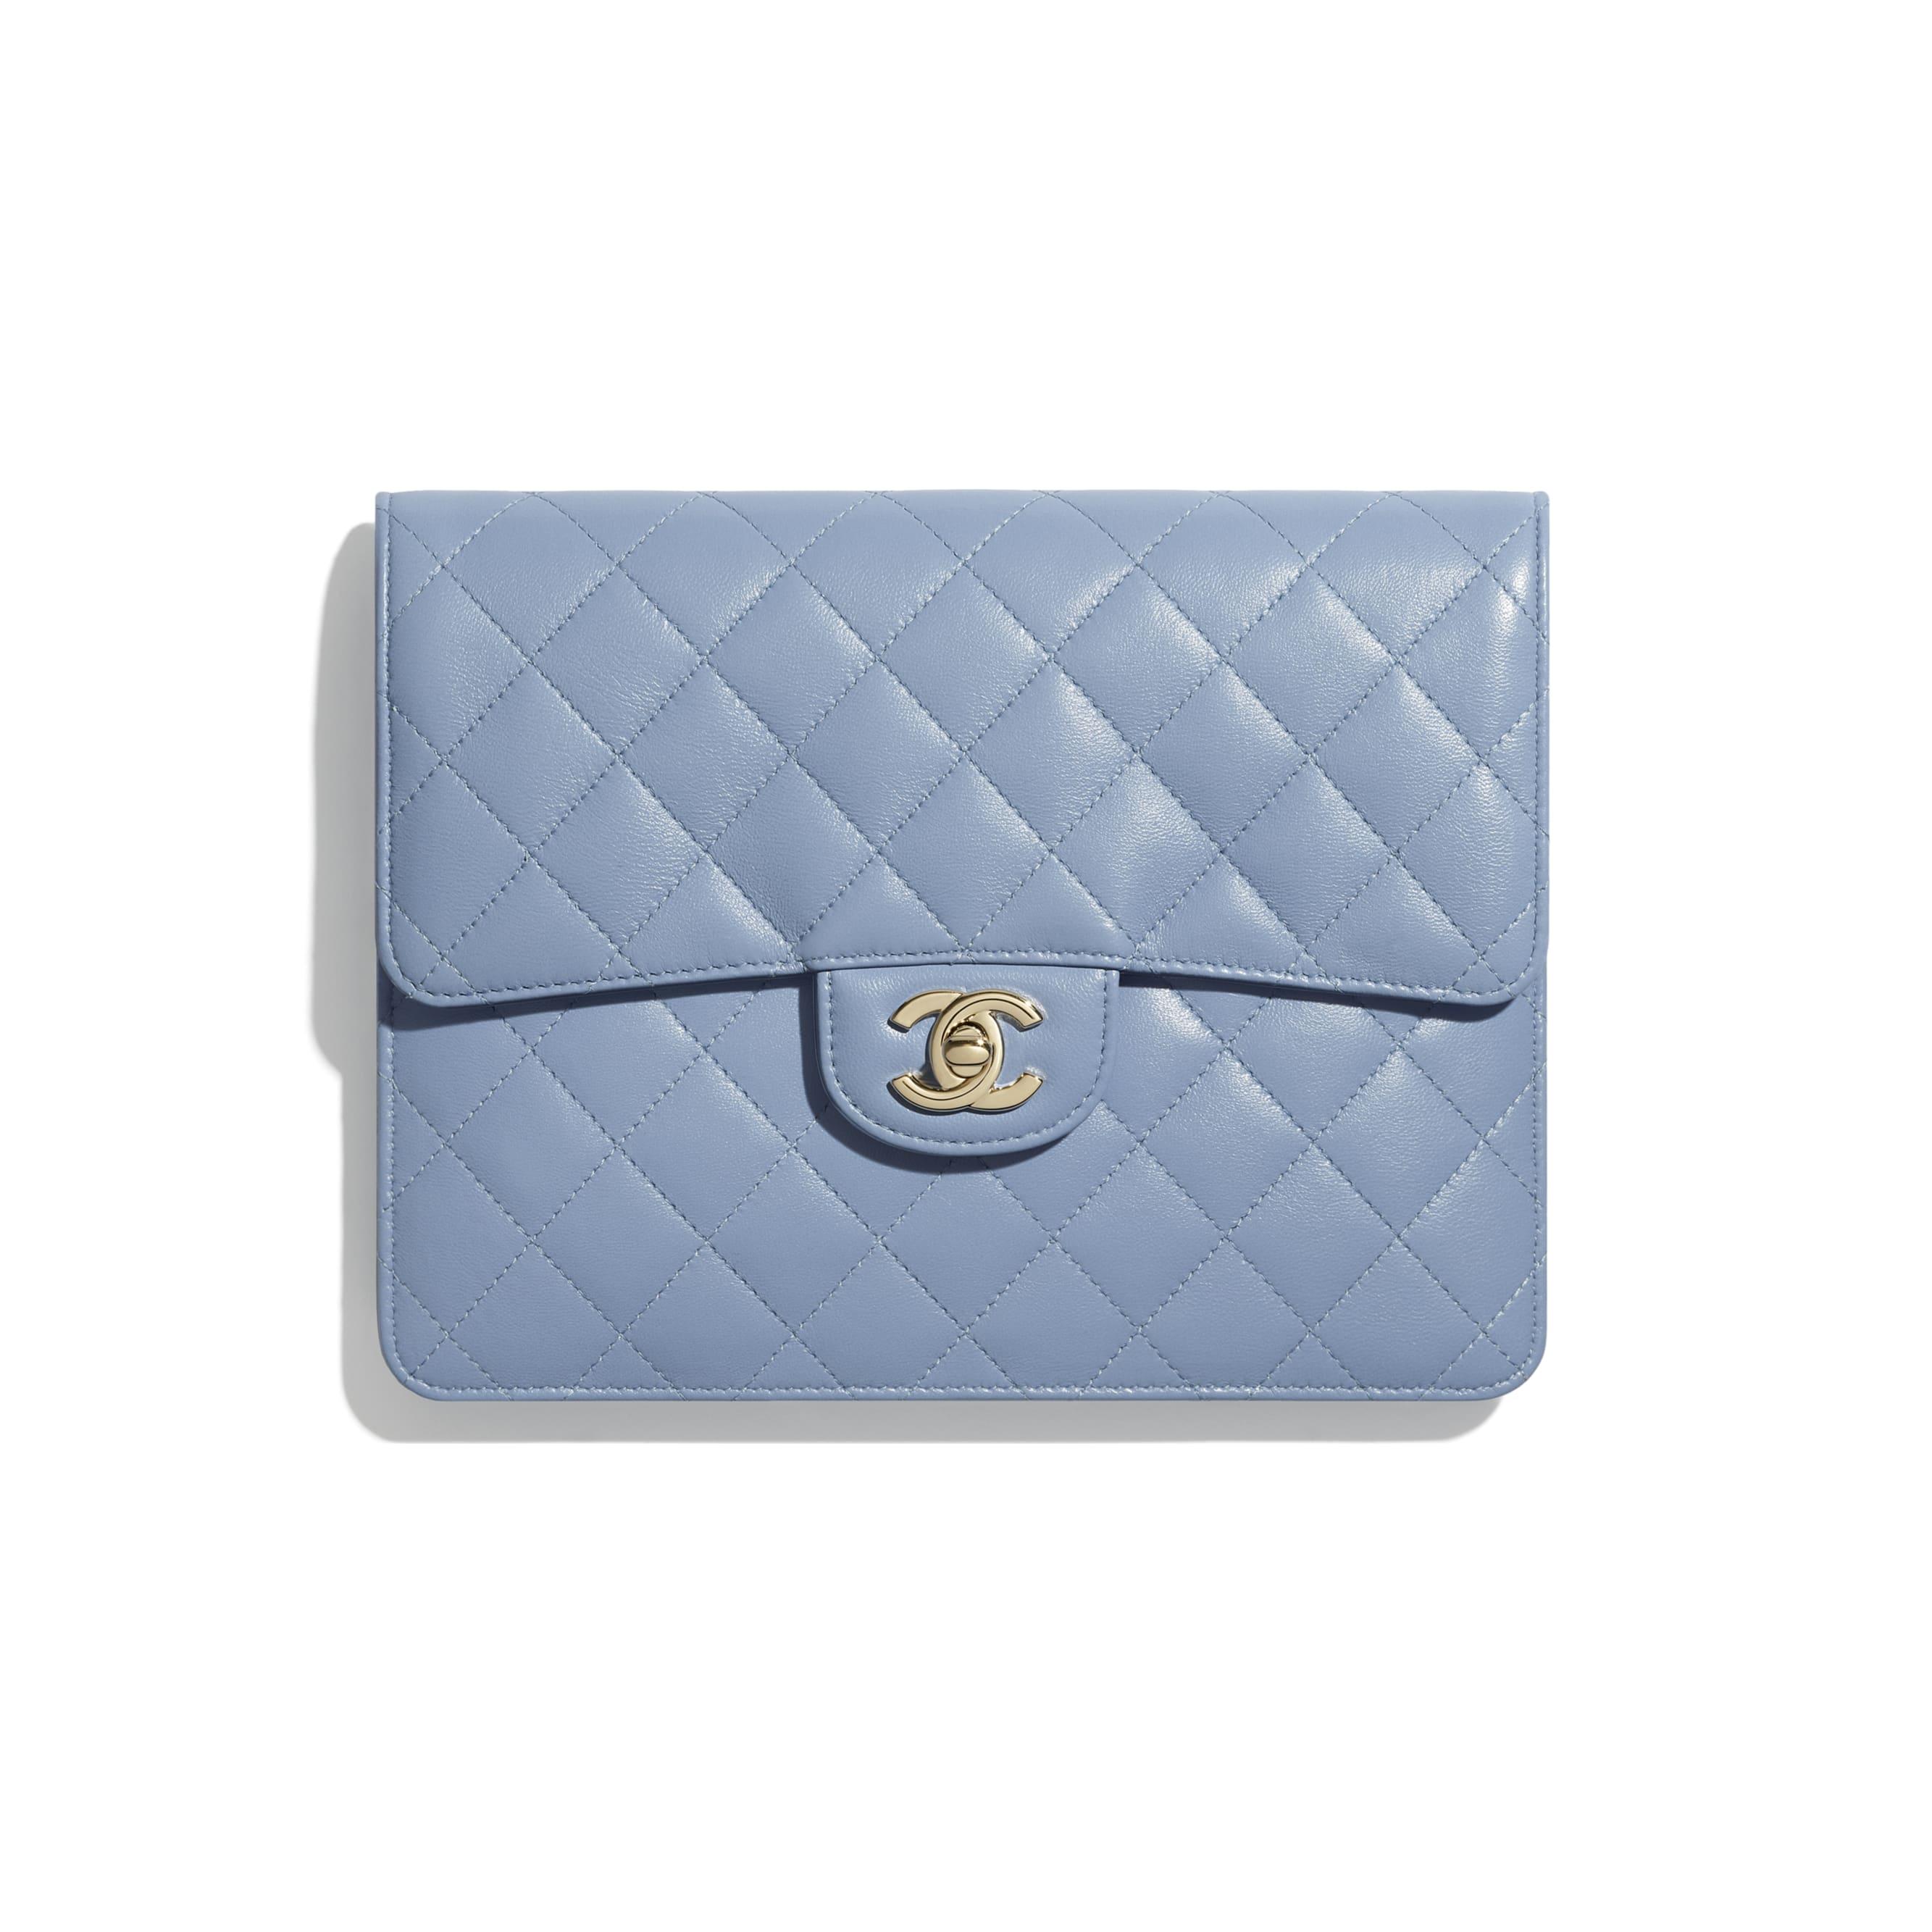 Flap Case - Sky Blue - Lambskin & Gold-Tone Metal - CHANEL - Default view - see standard sized version